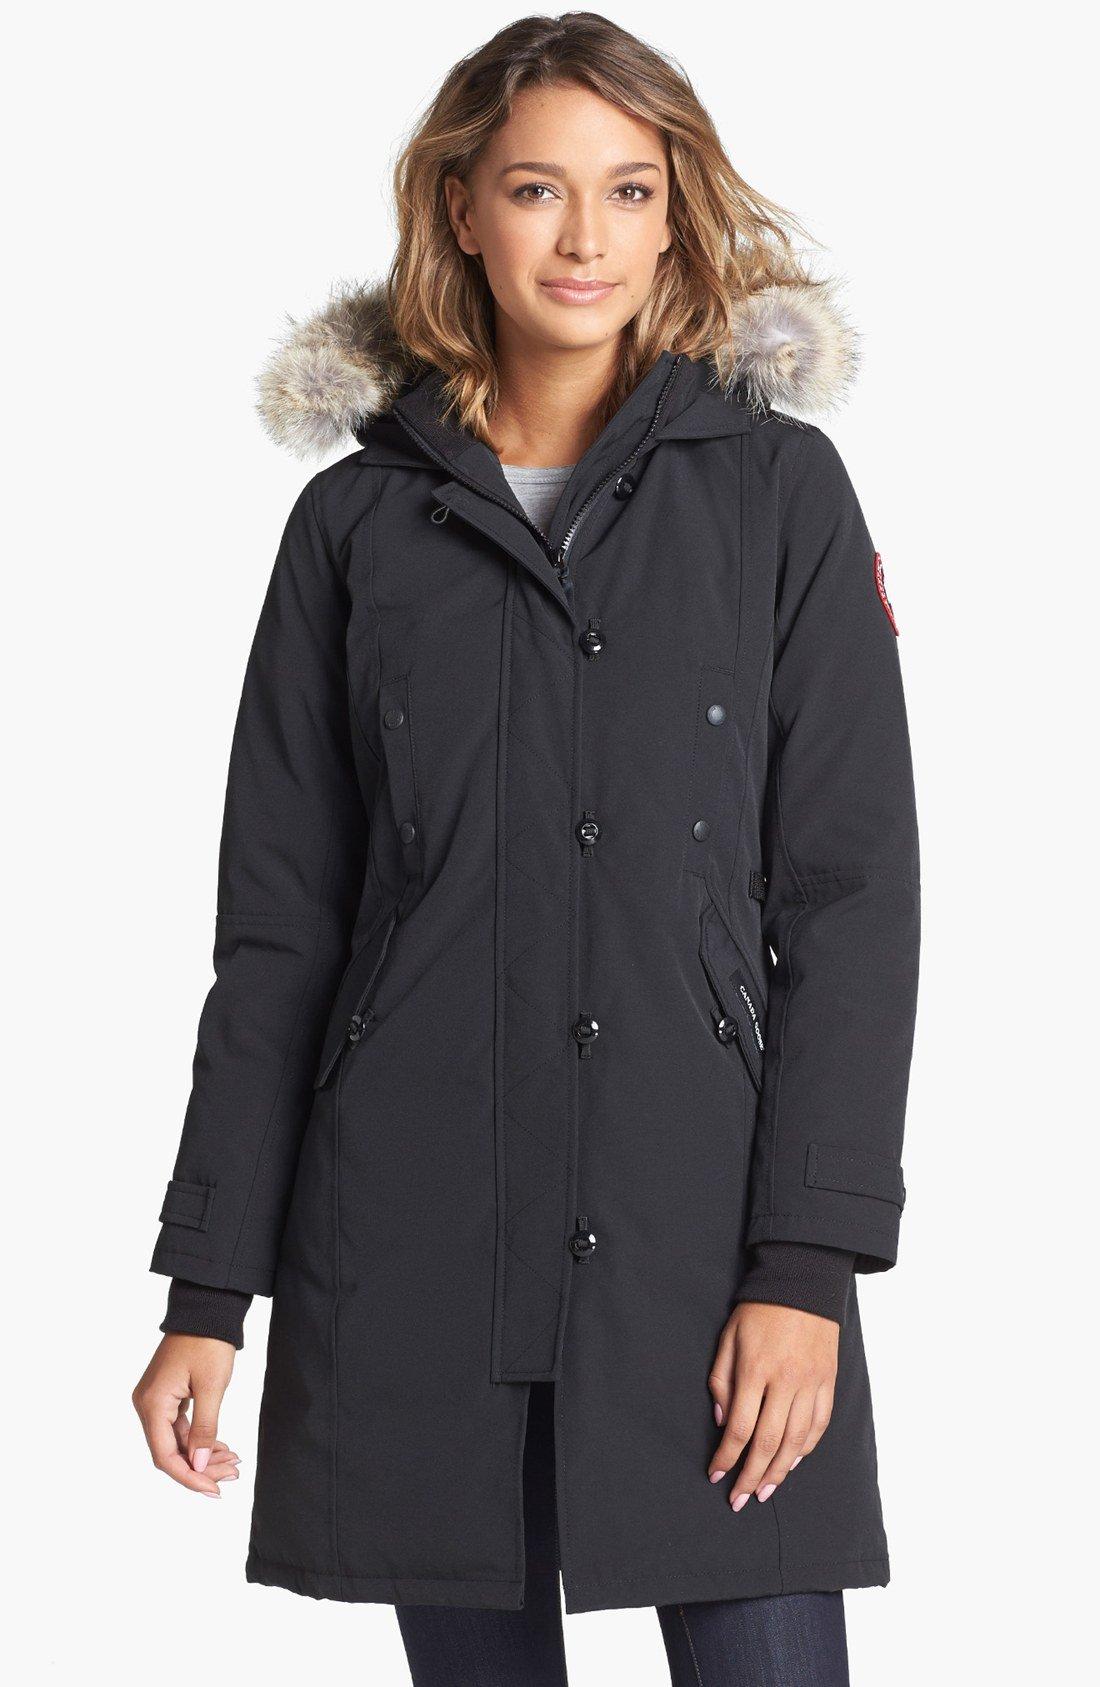 Coats for women canada